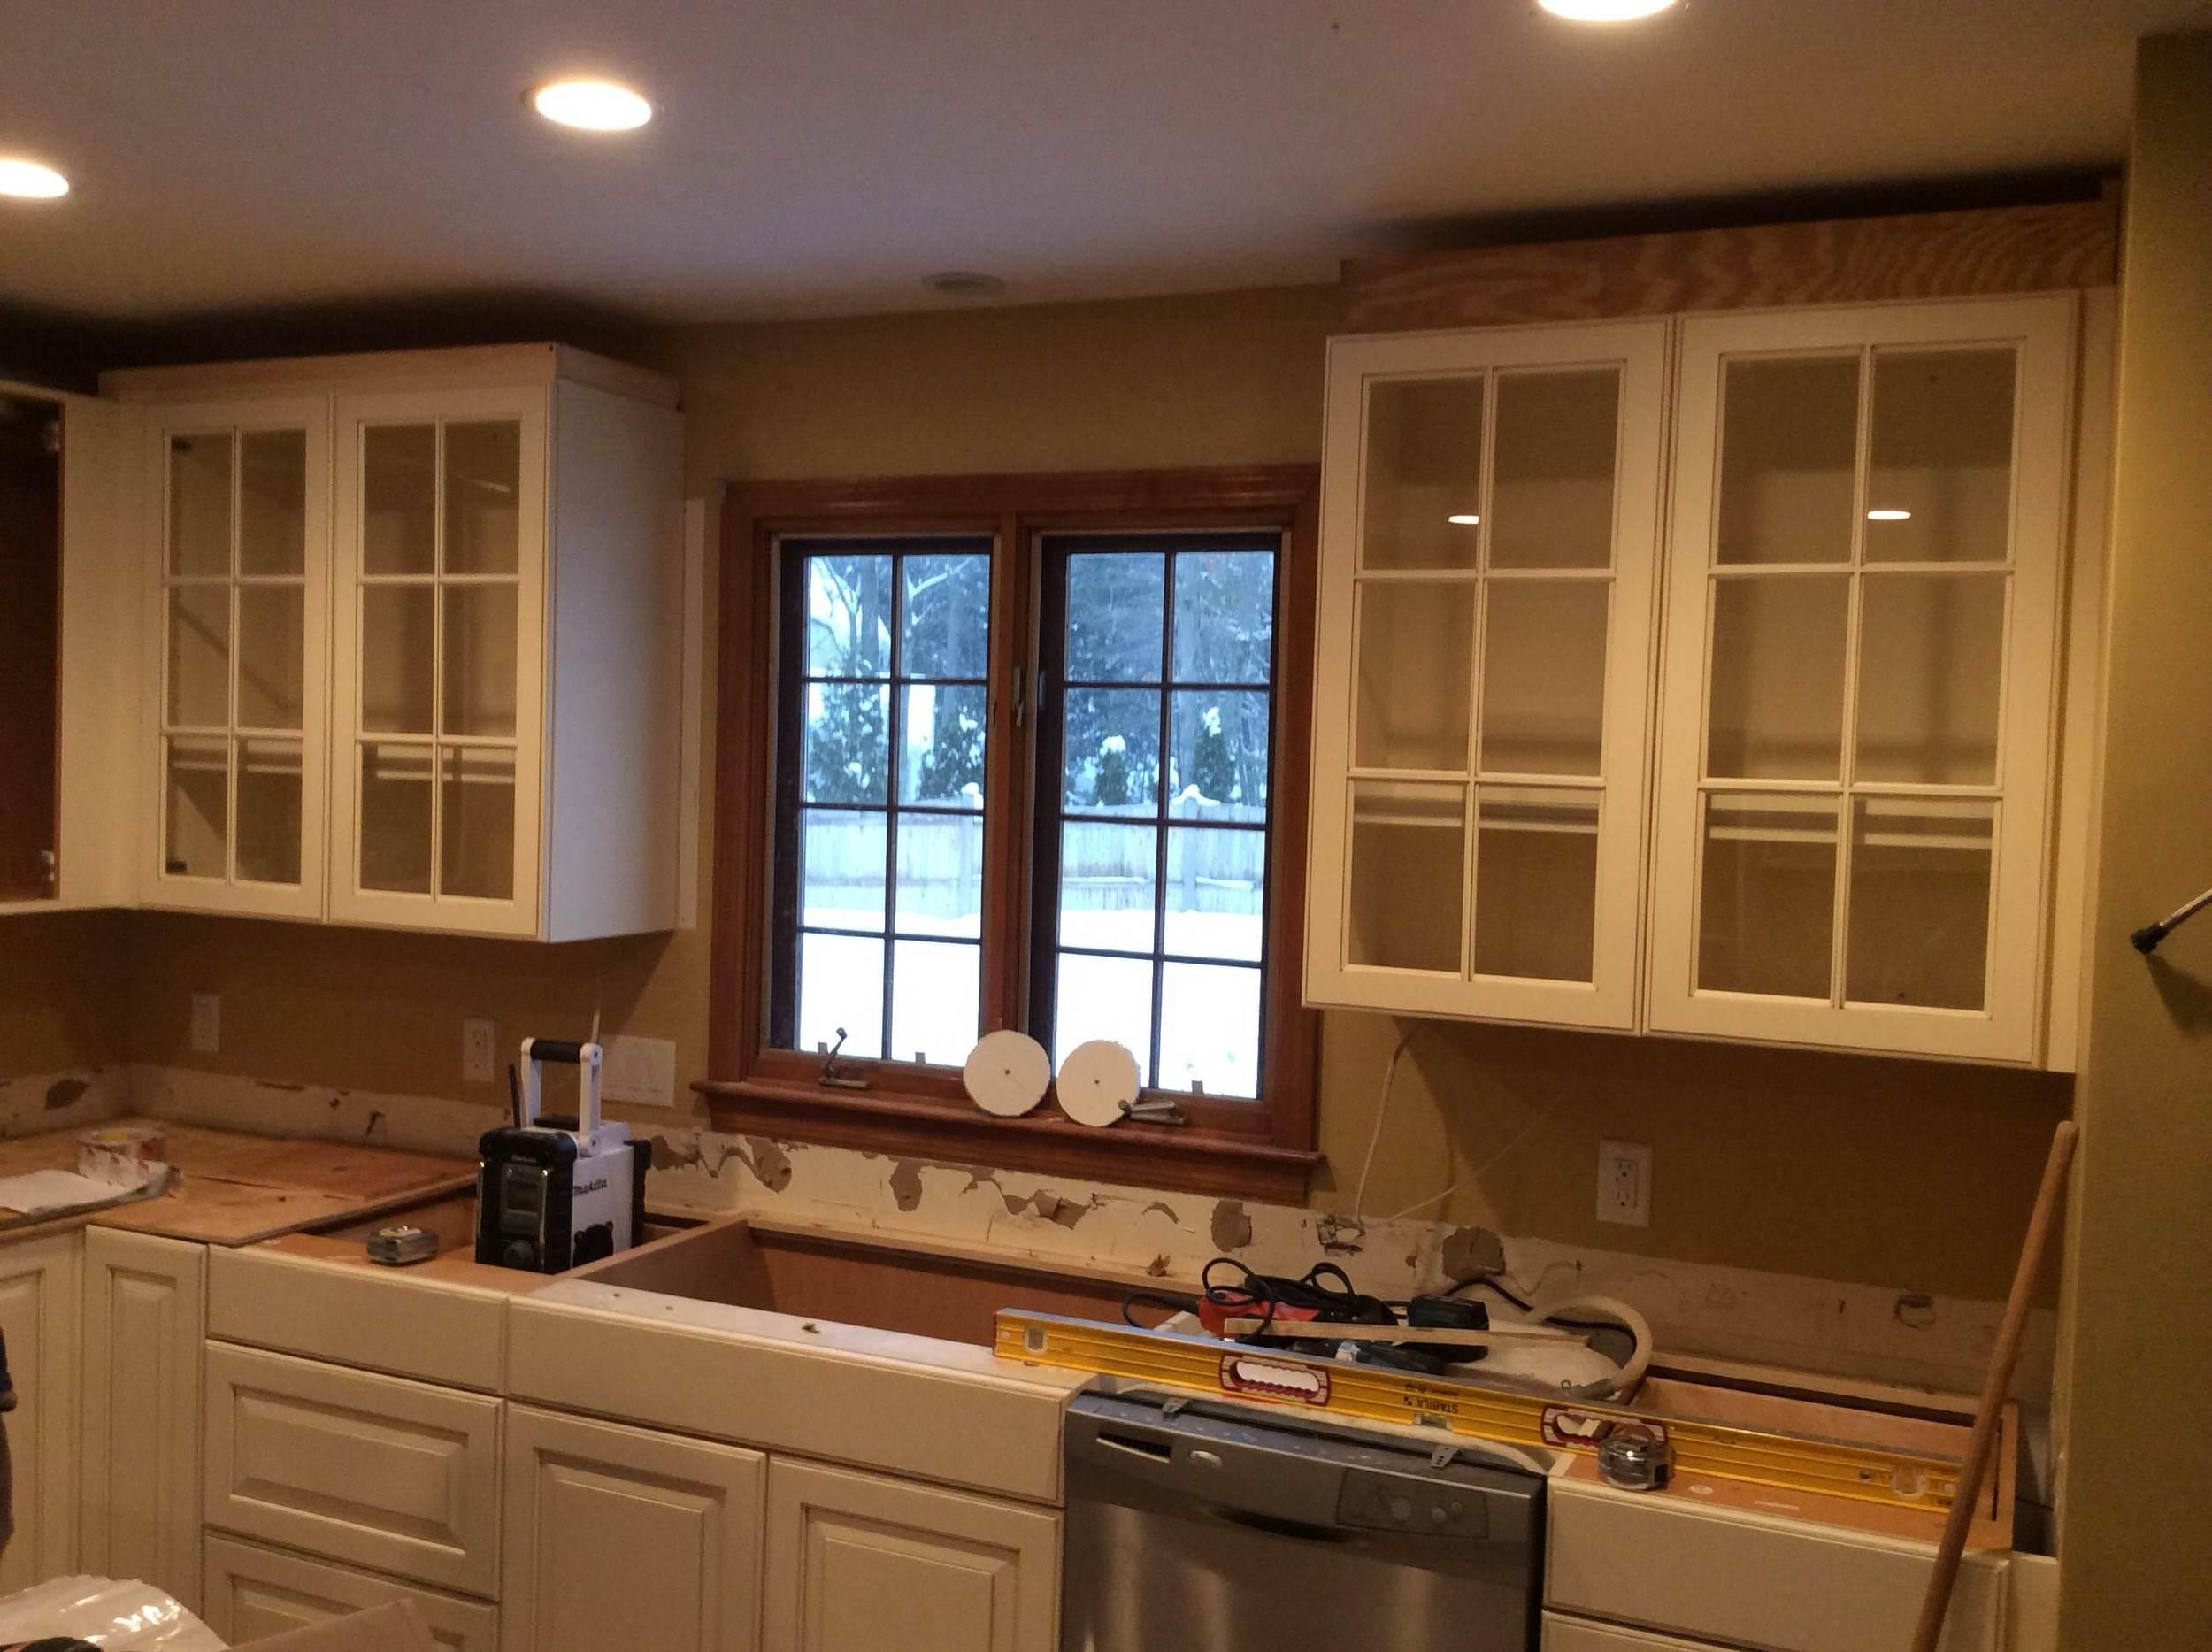 Walt-Perkins-Remodel-Kitchen-Associates-11.jpg